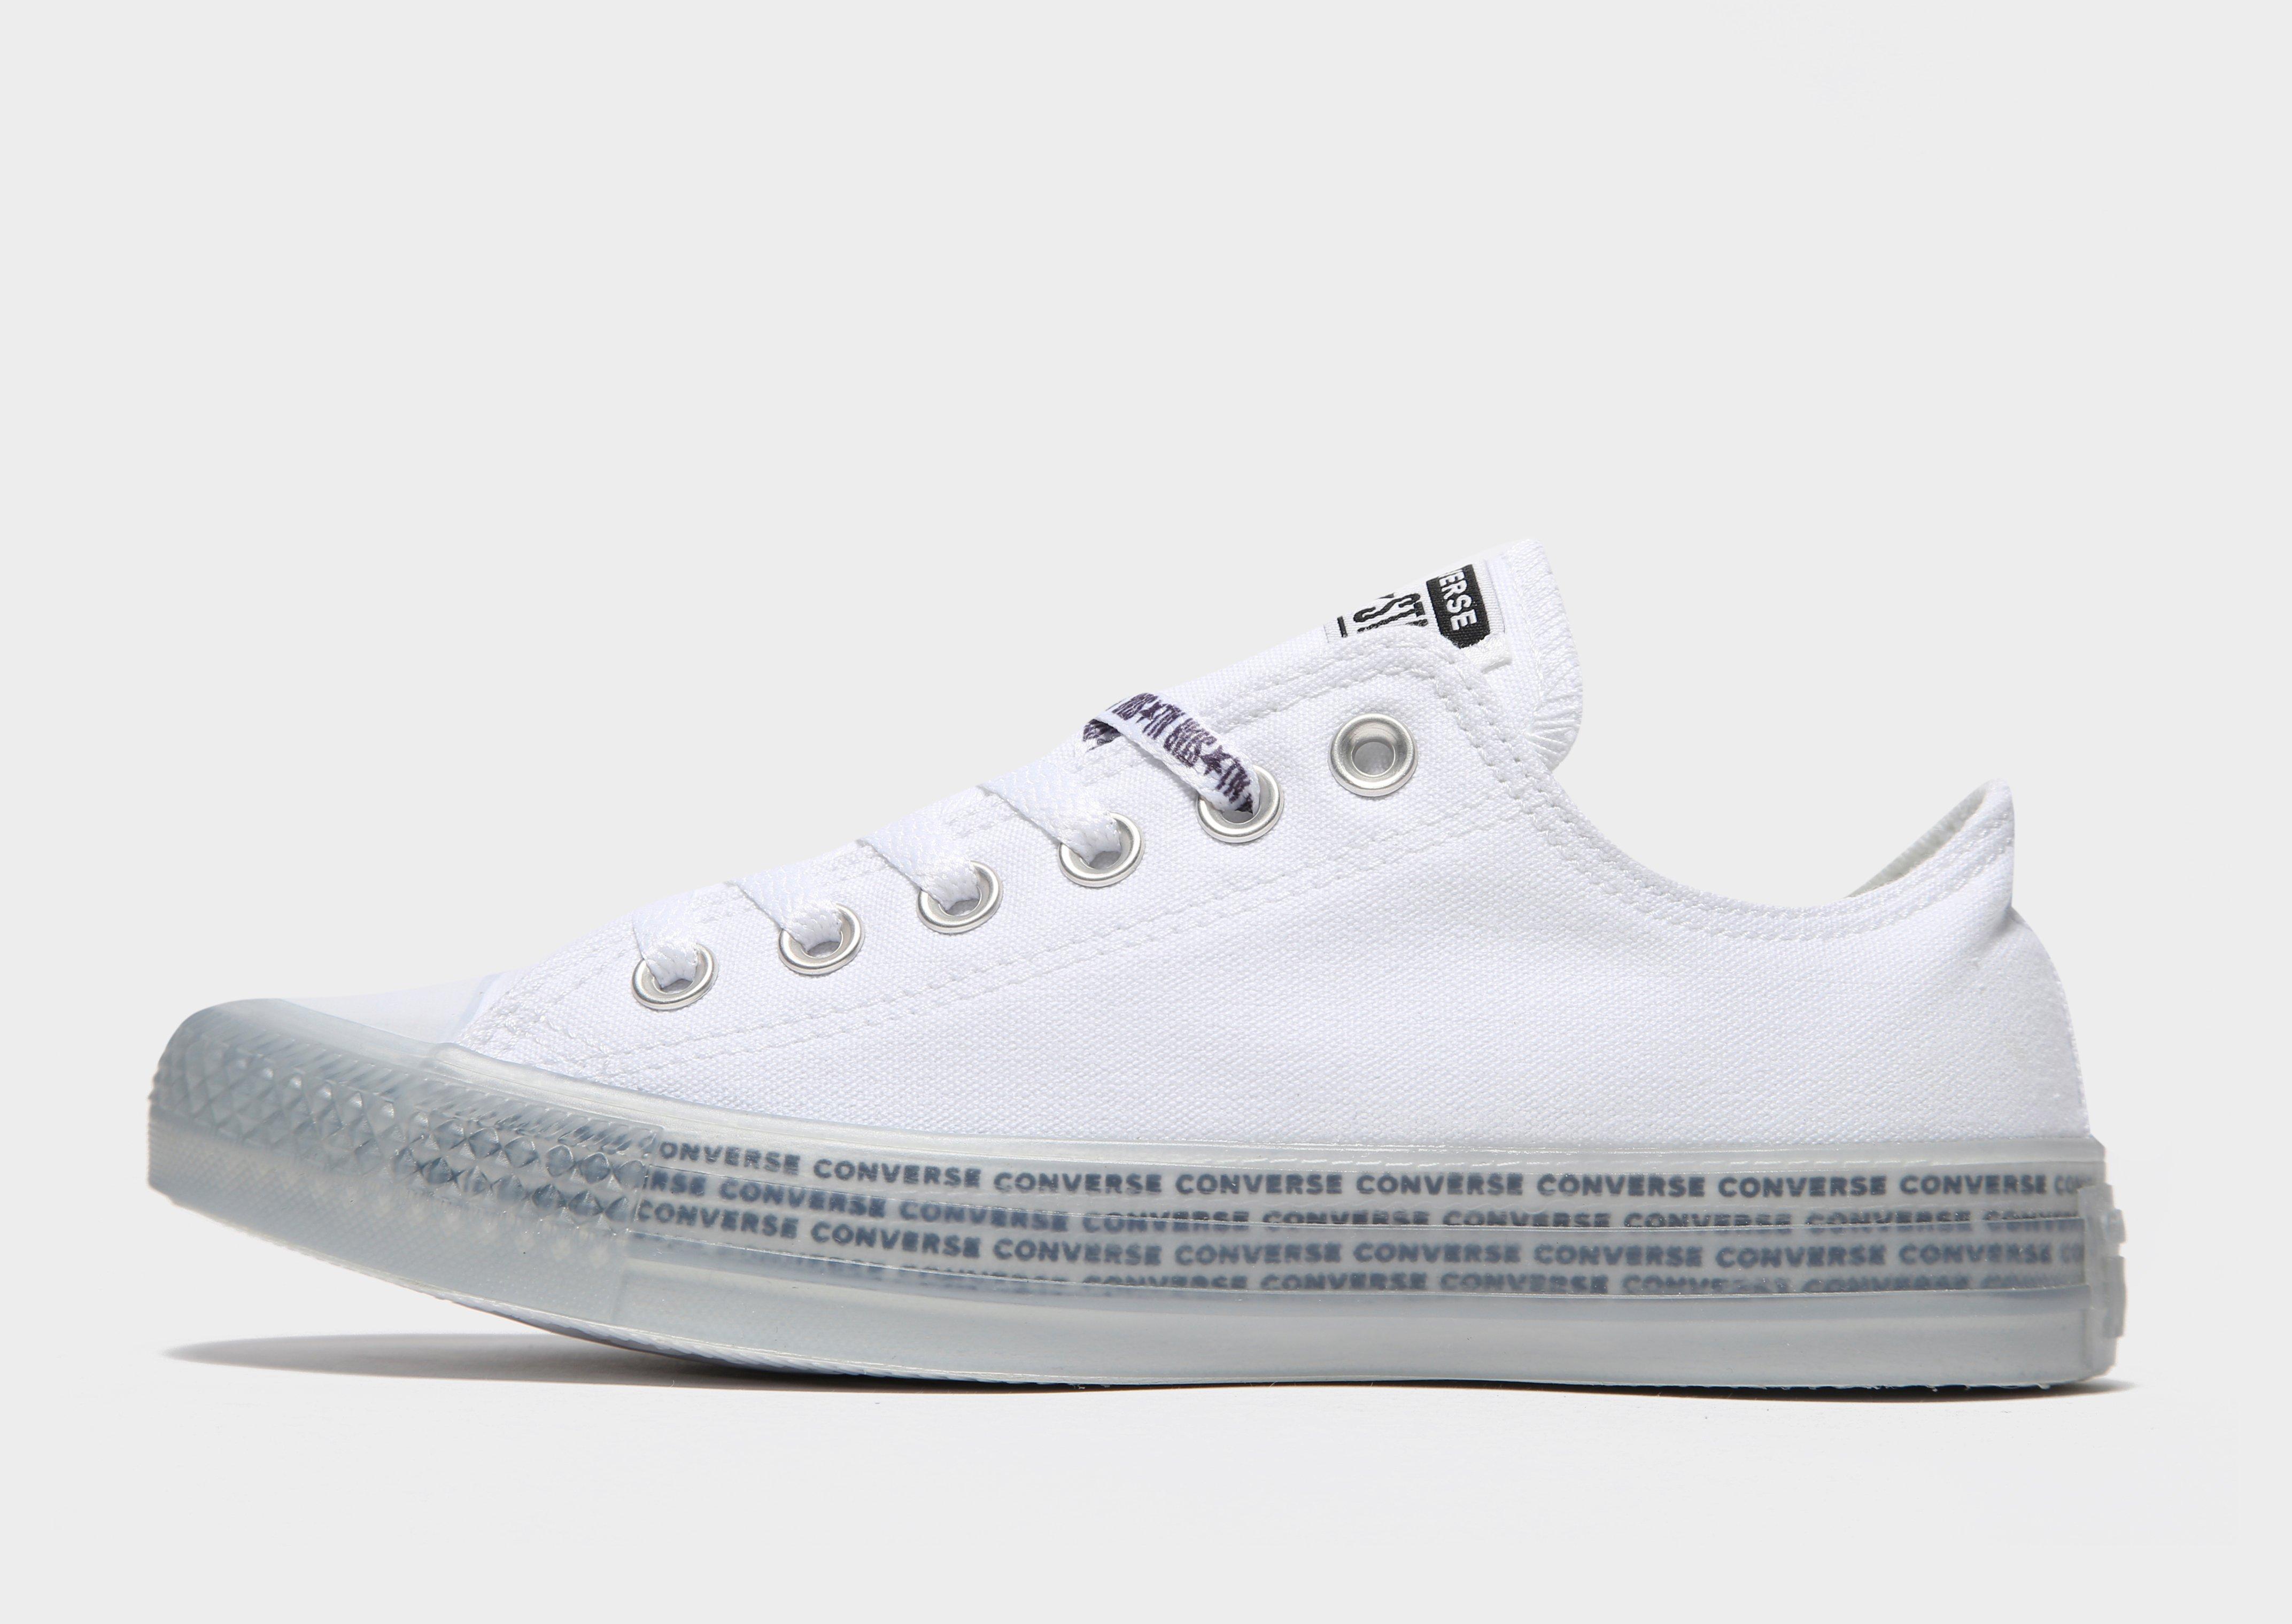 Zumbido A bordo facil de manejar  Acheter Blanc Converse Baskets Chuck Taylor All Star Ox Femme